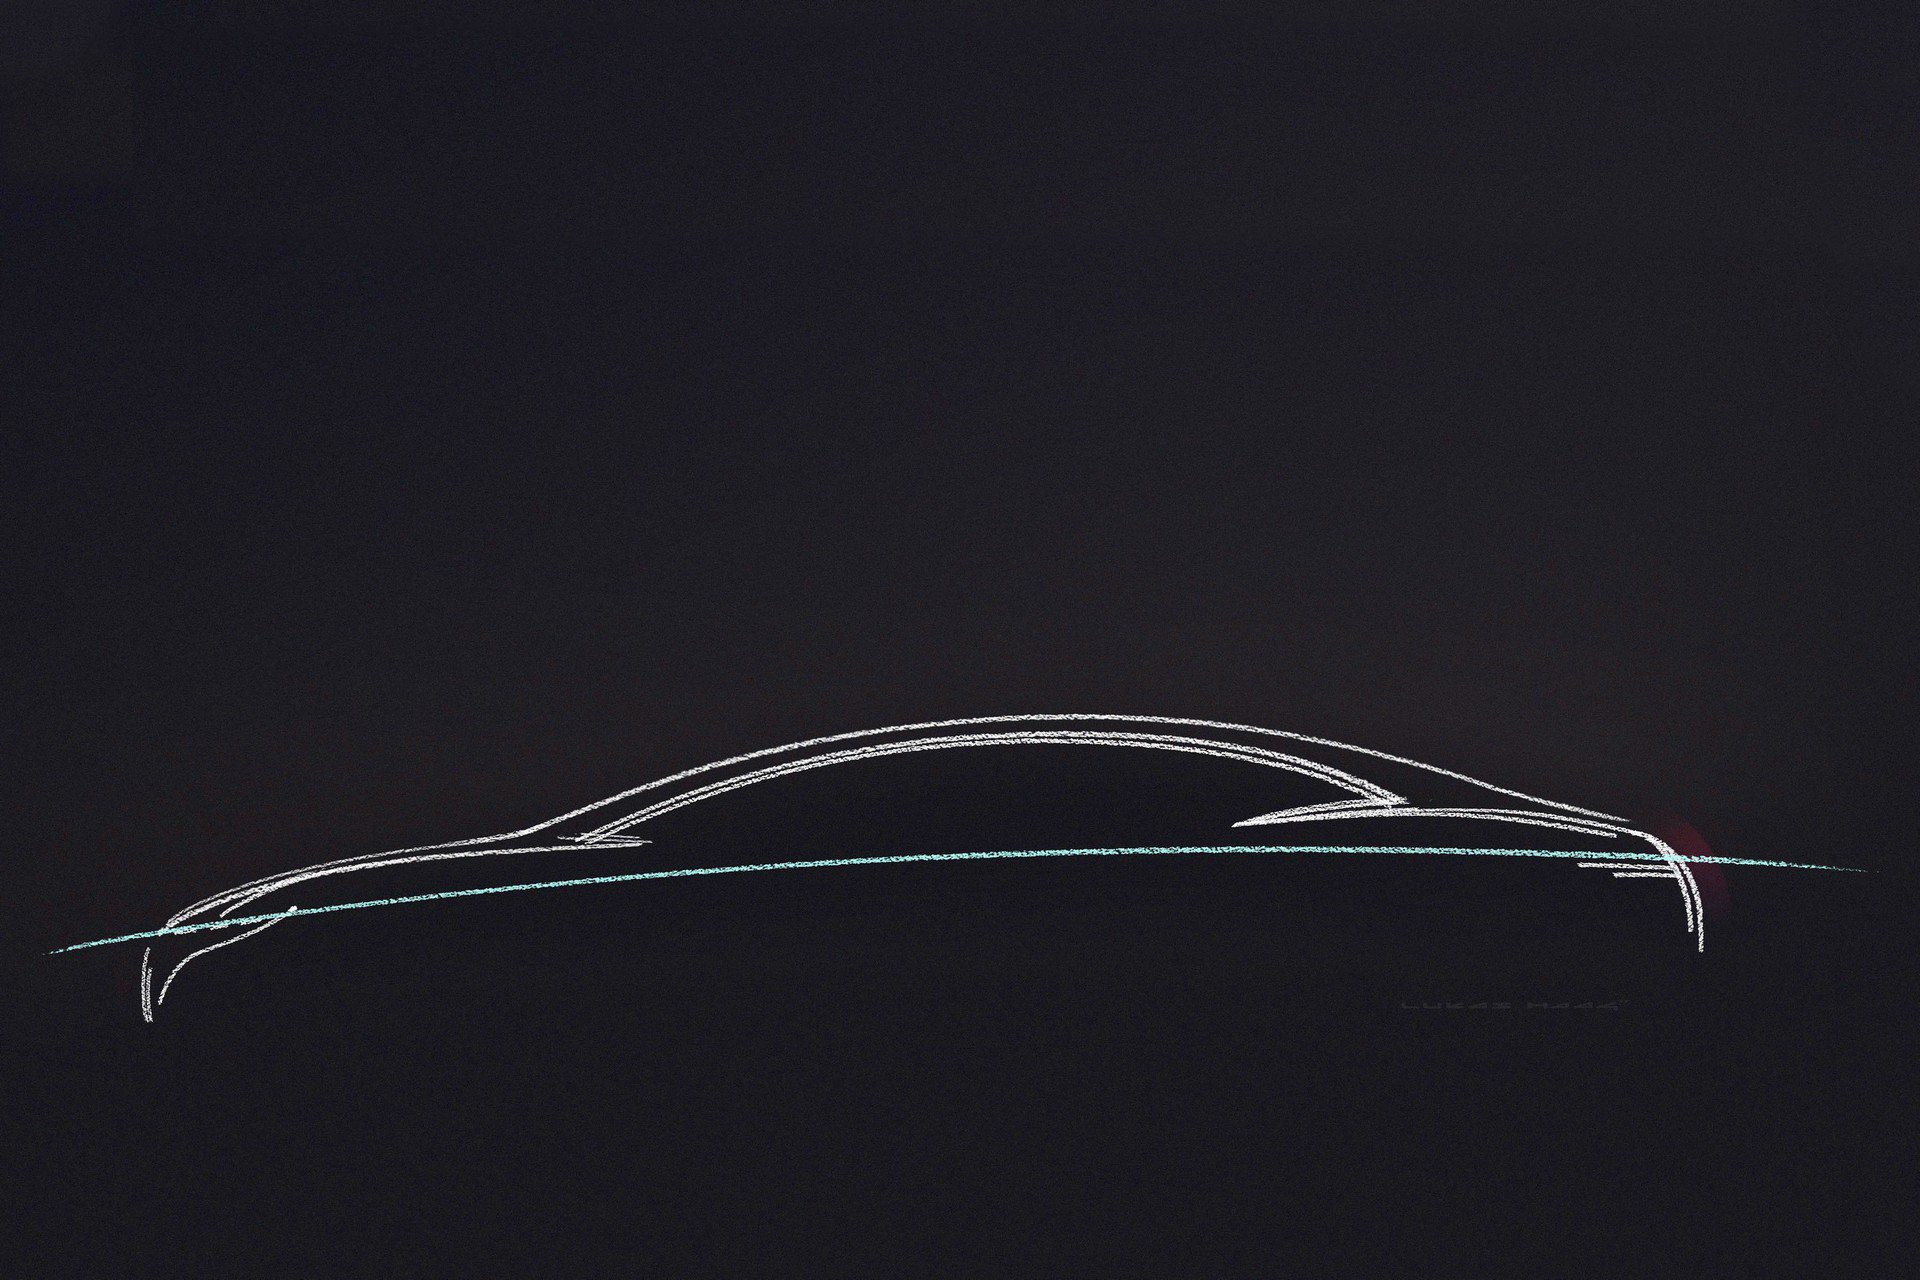 mercedes-benz-eq-concept-interior-teased-5.jpg